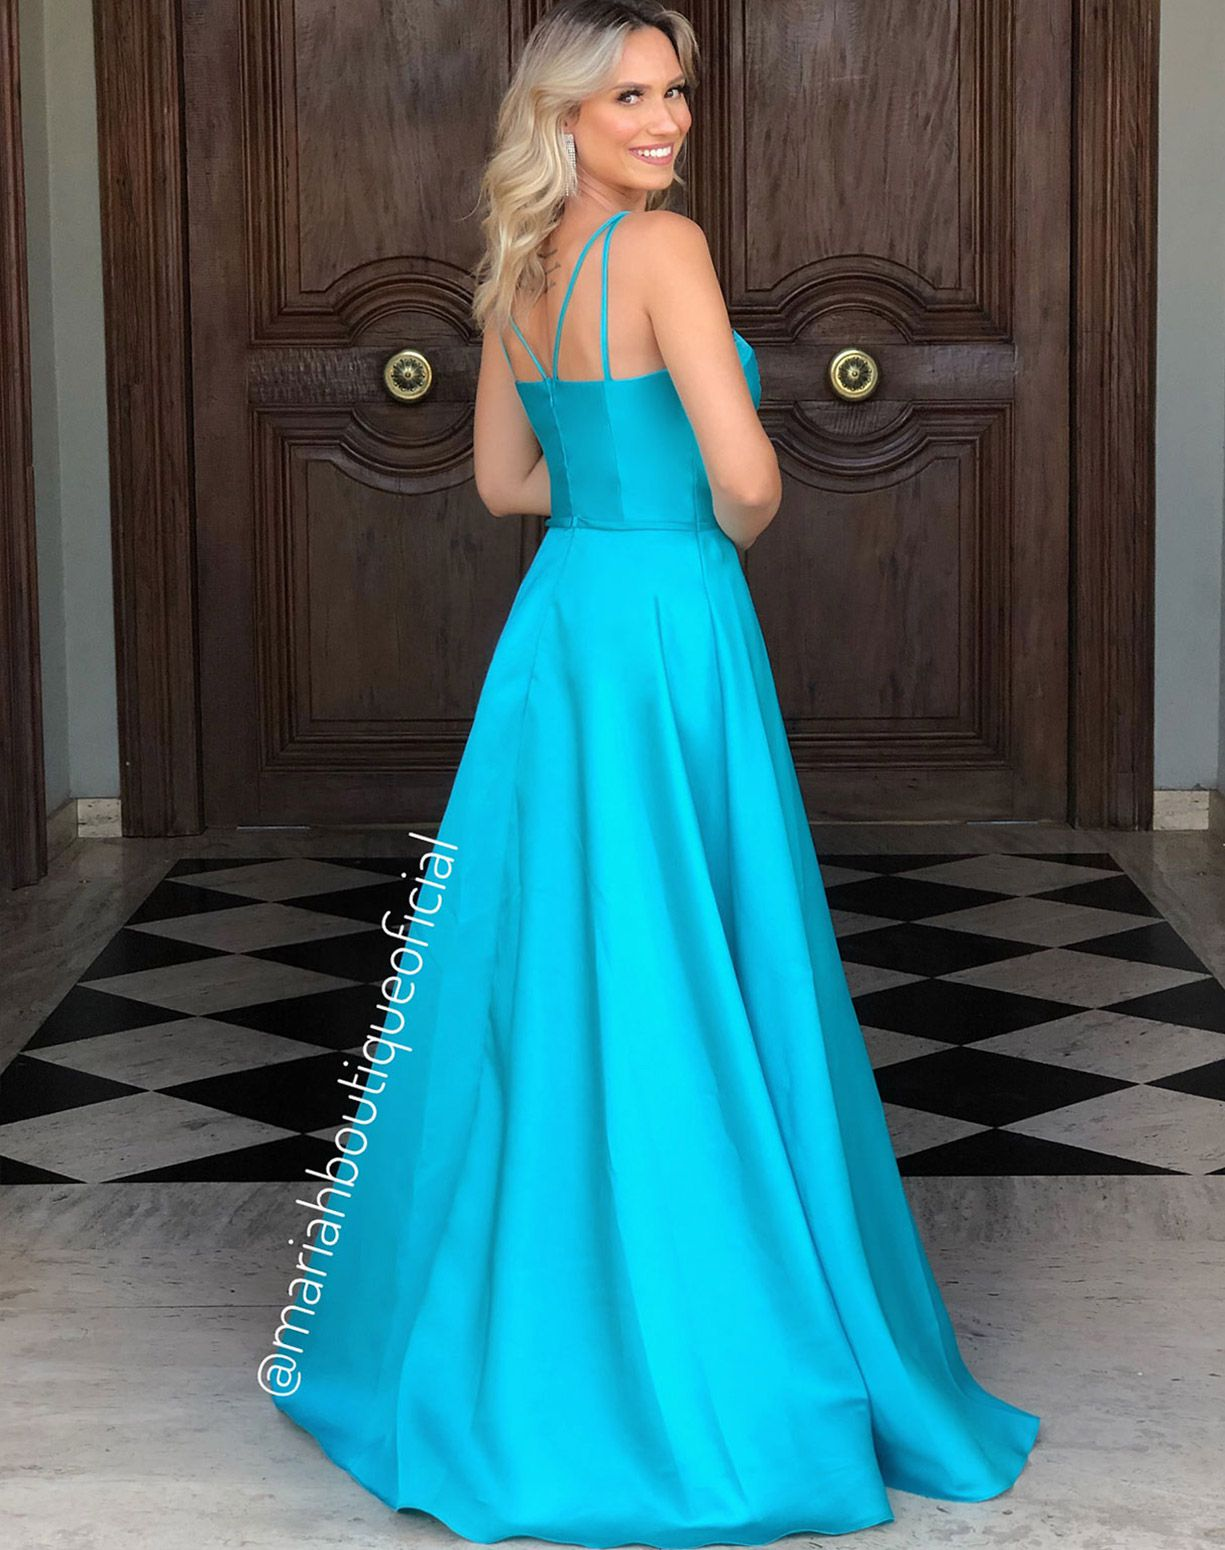 Vestido Tiffany Corpete em Zibeline